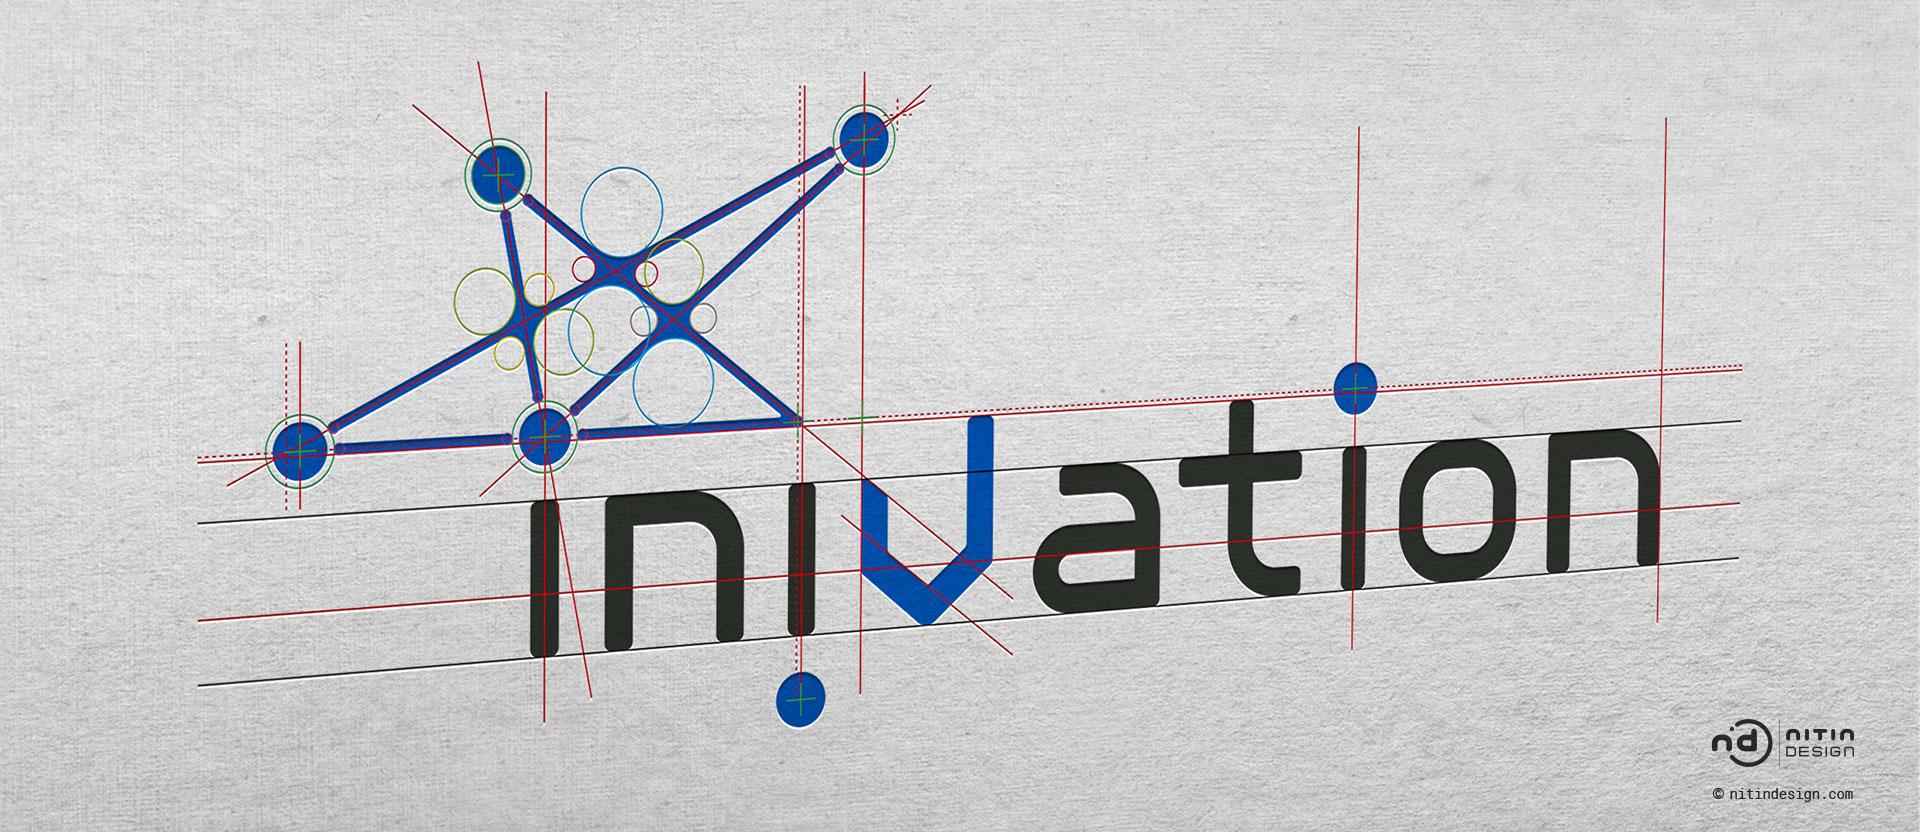 IniVation-Nitin-Design